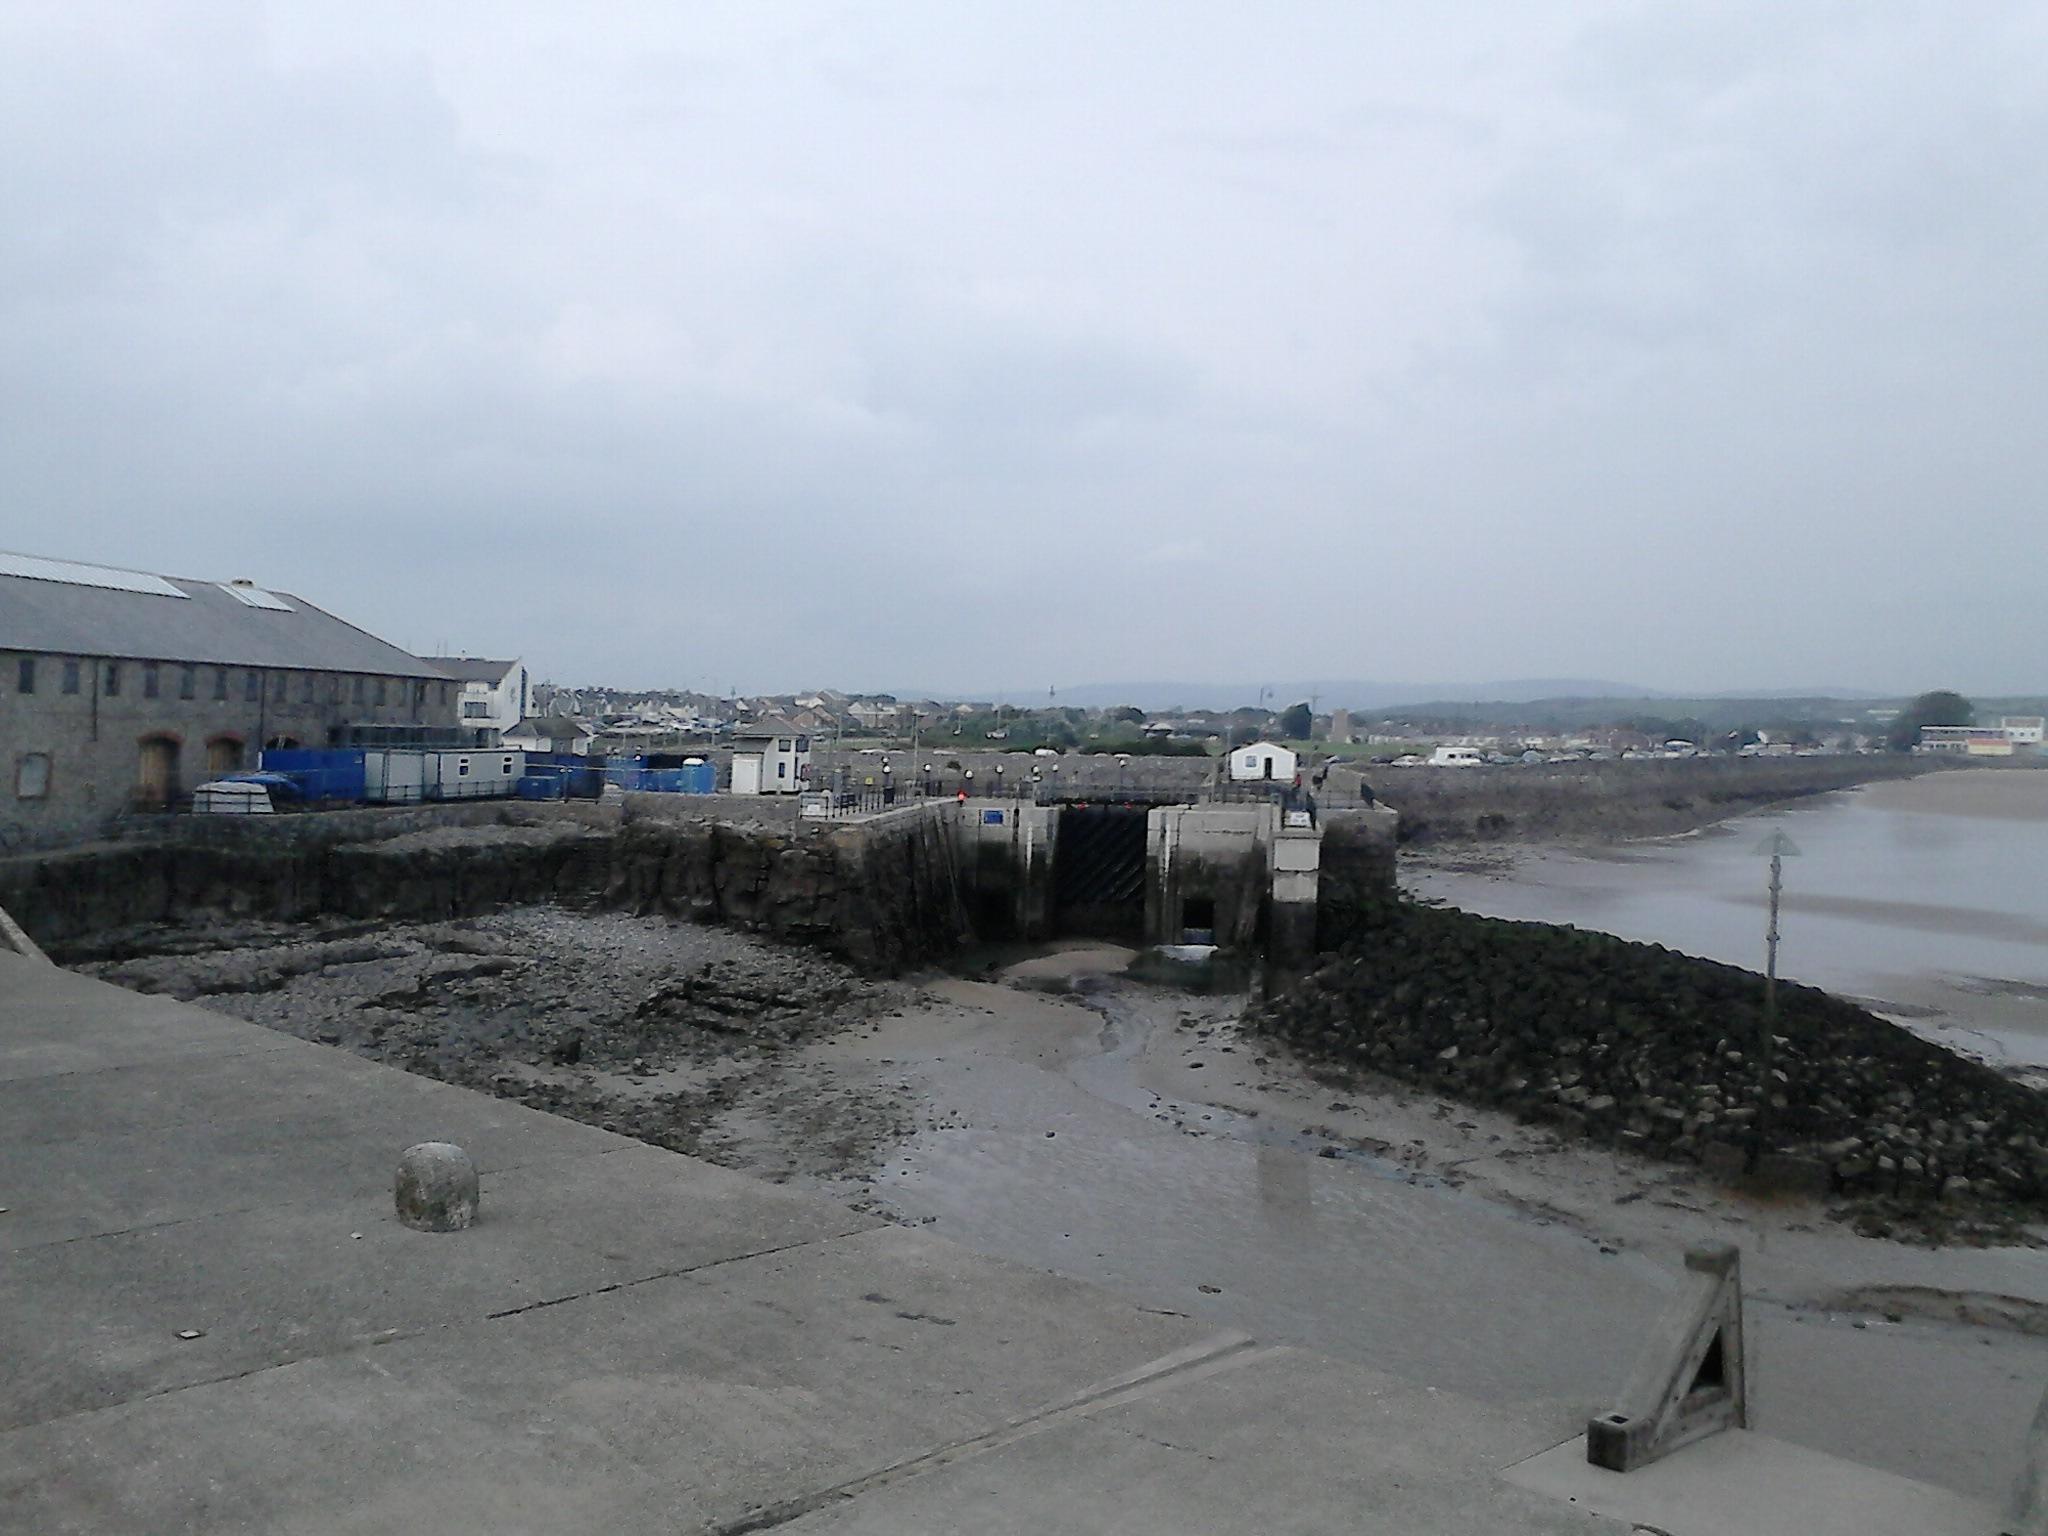 Docks Entrance At Porthcawl by kgpl